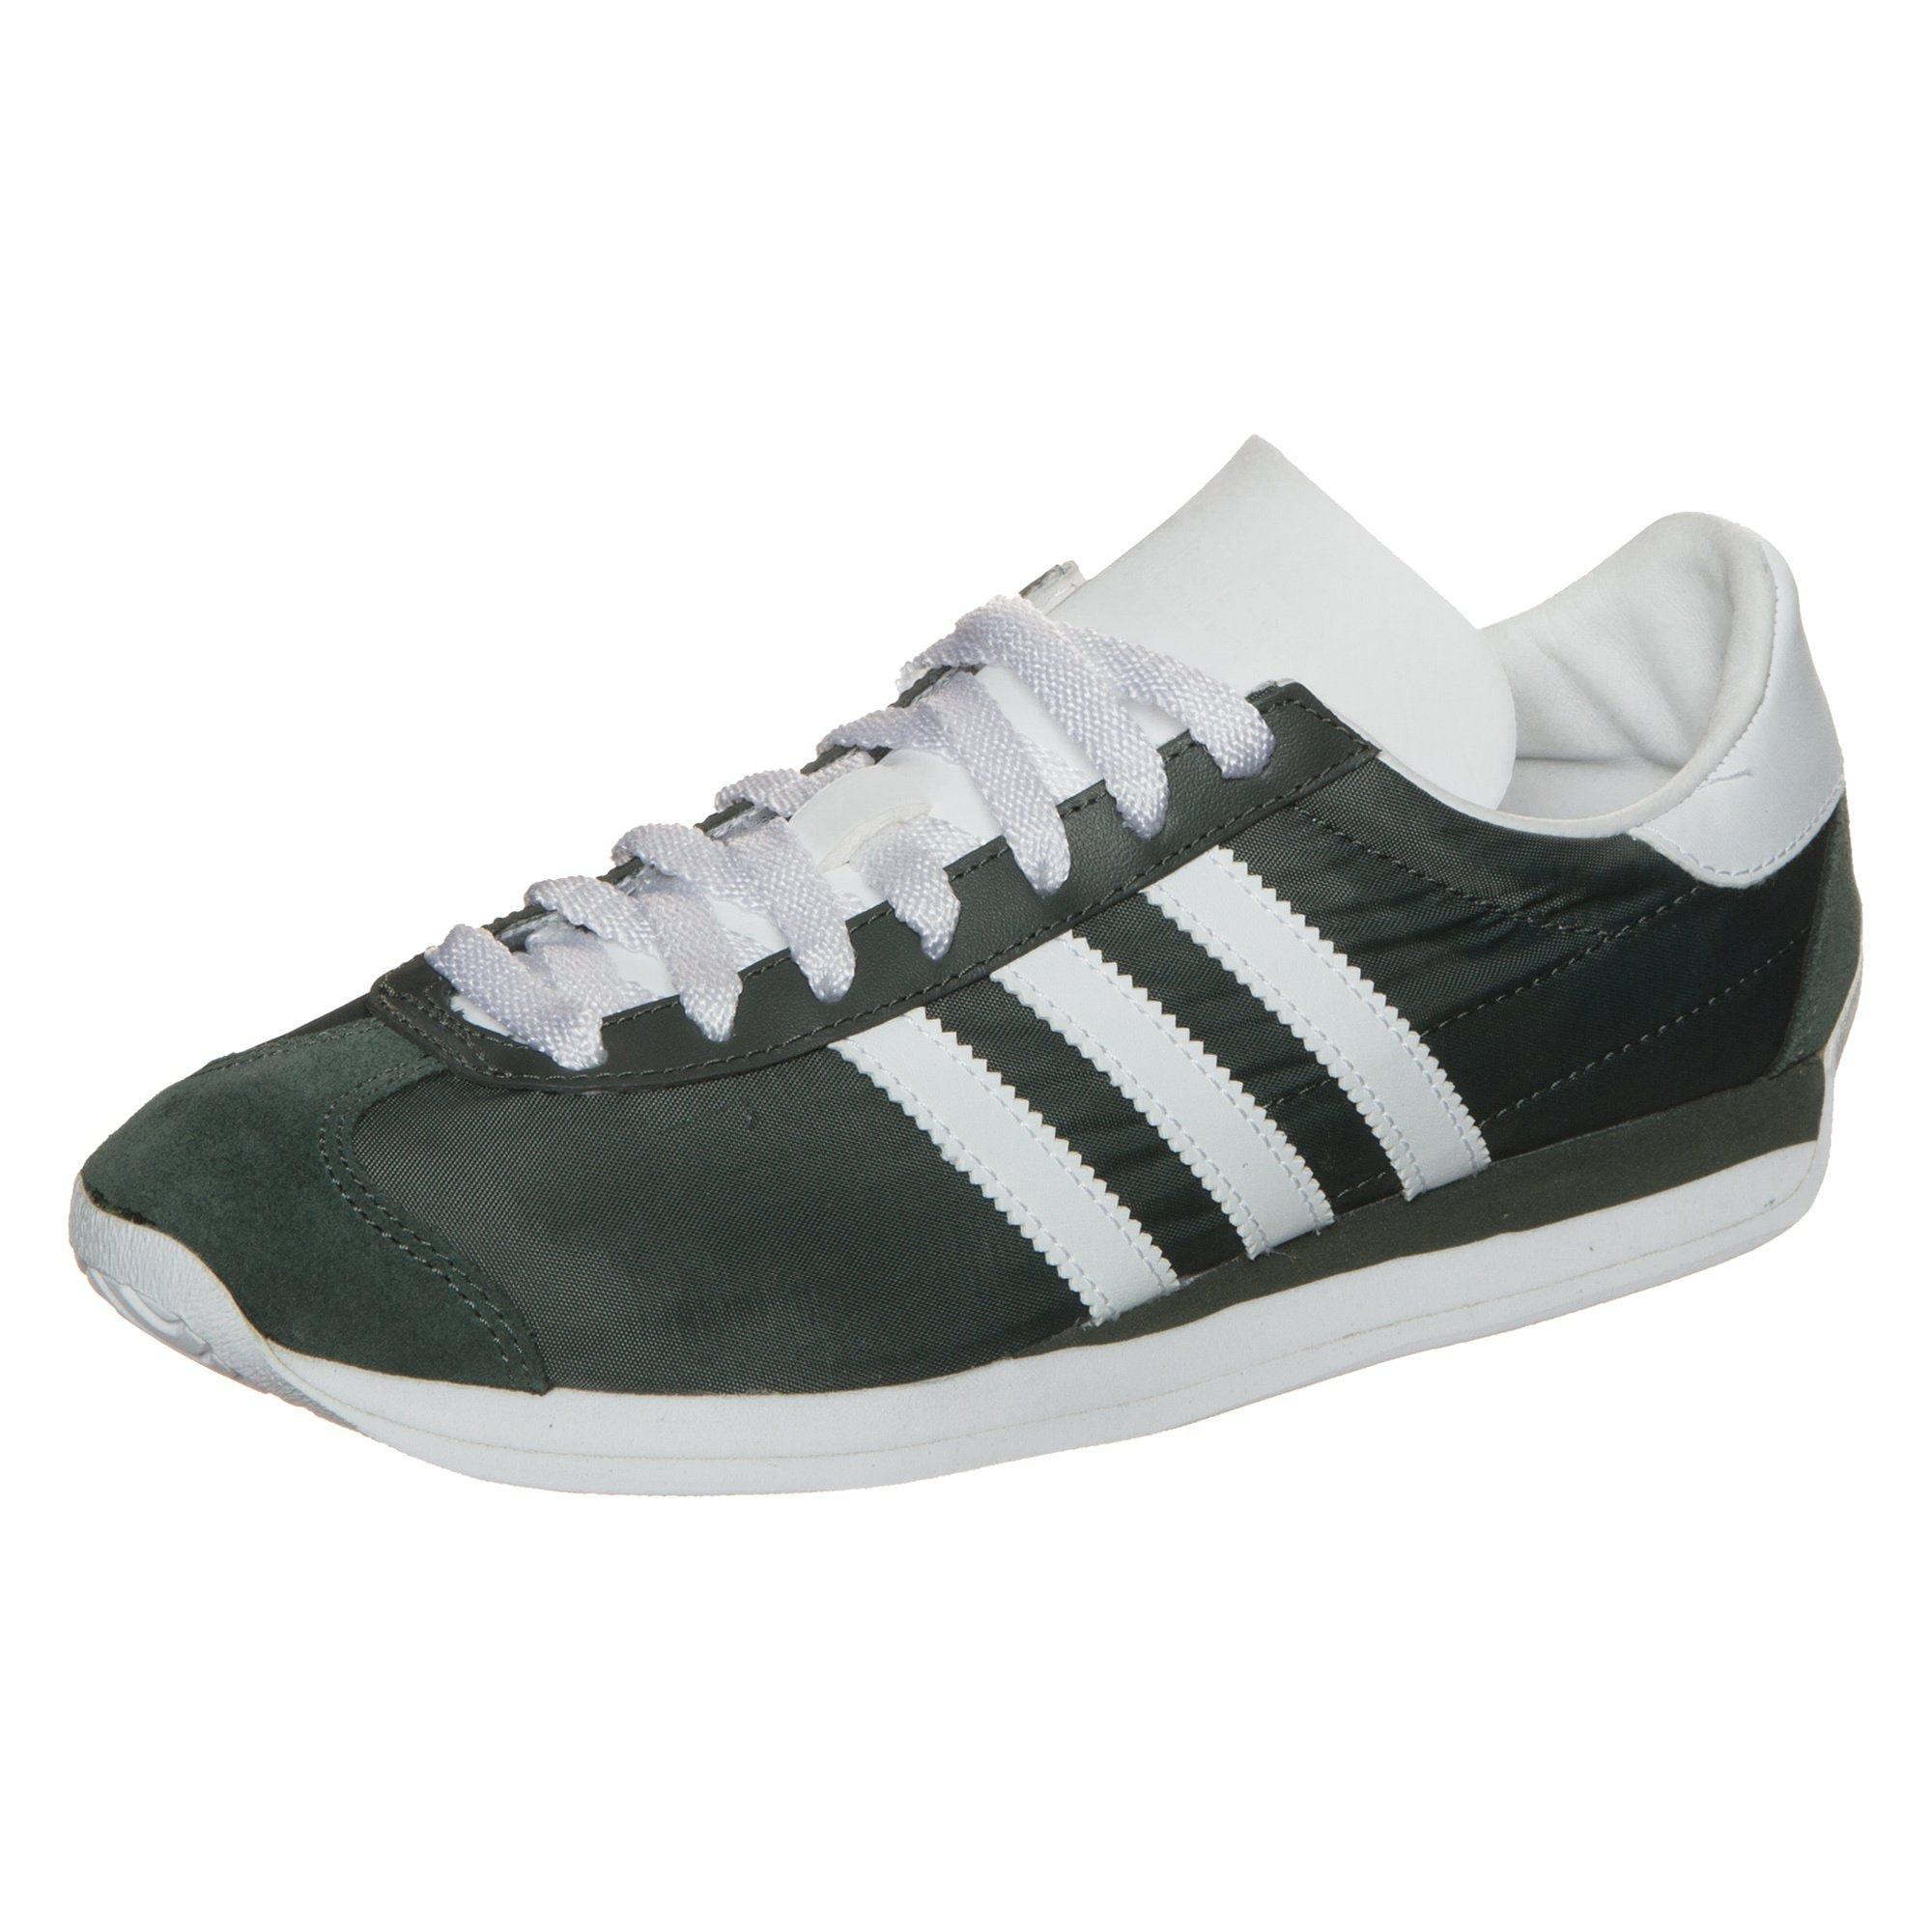 Image of adidas Originals Country OG Sneaker Damen